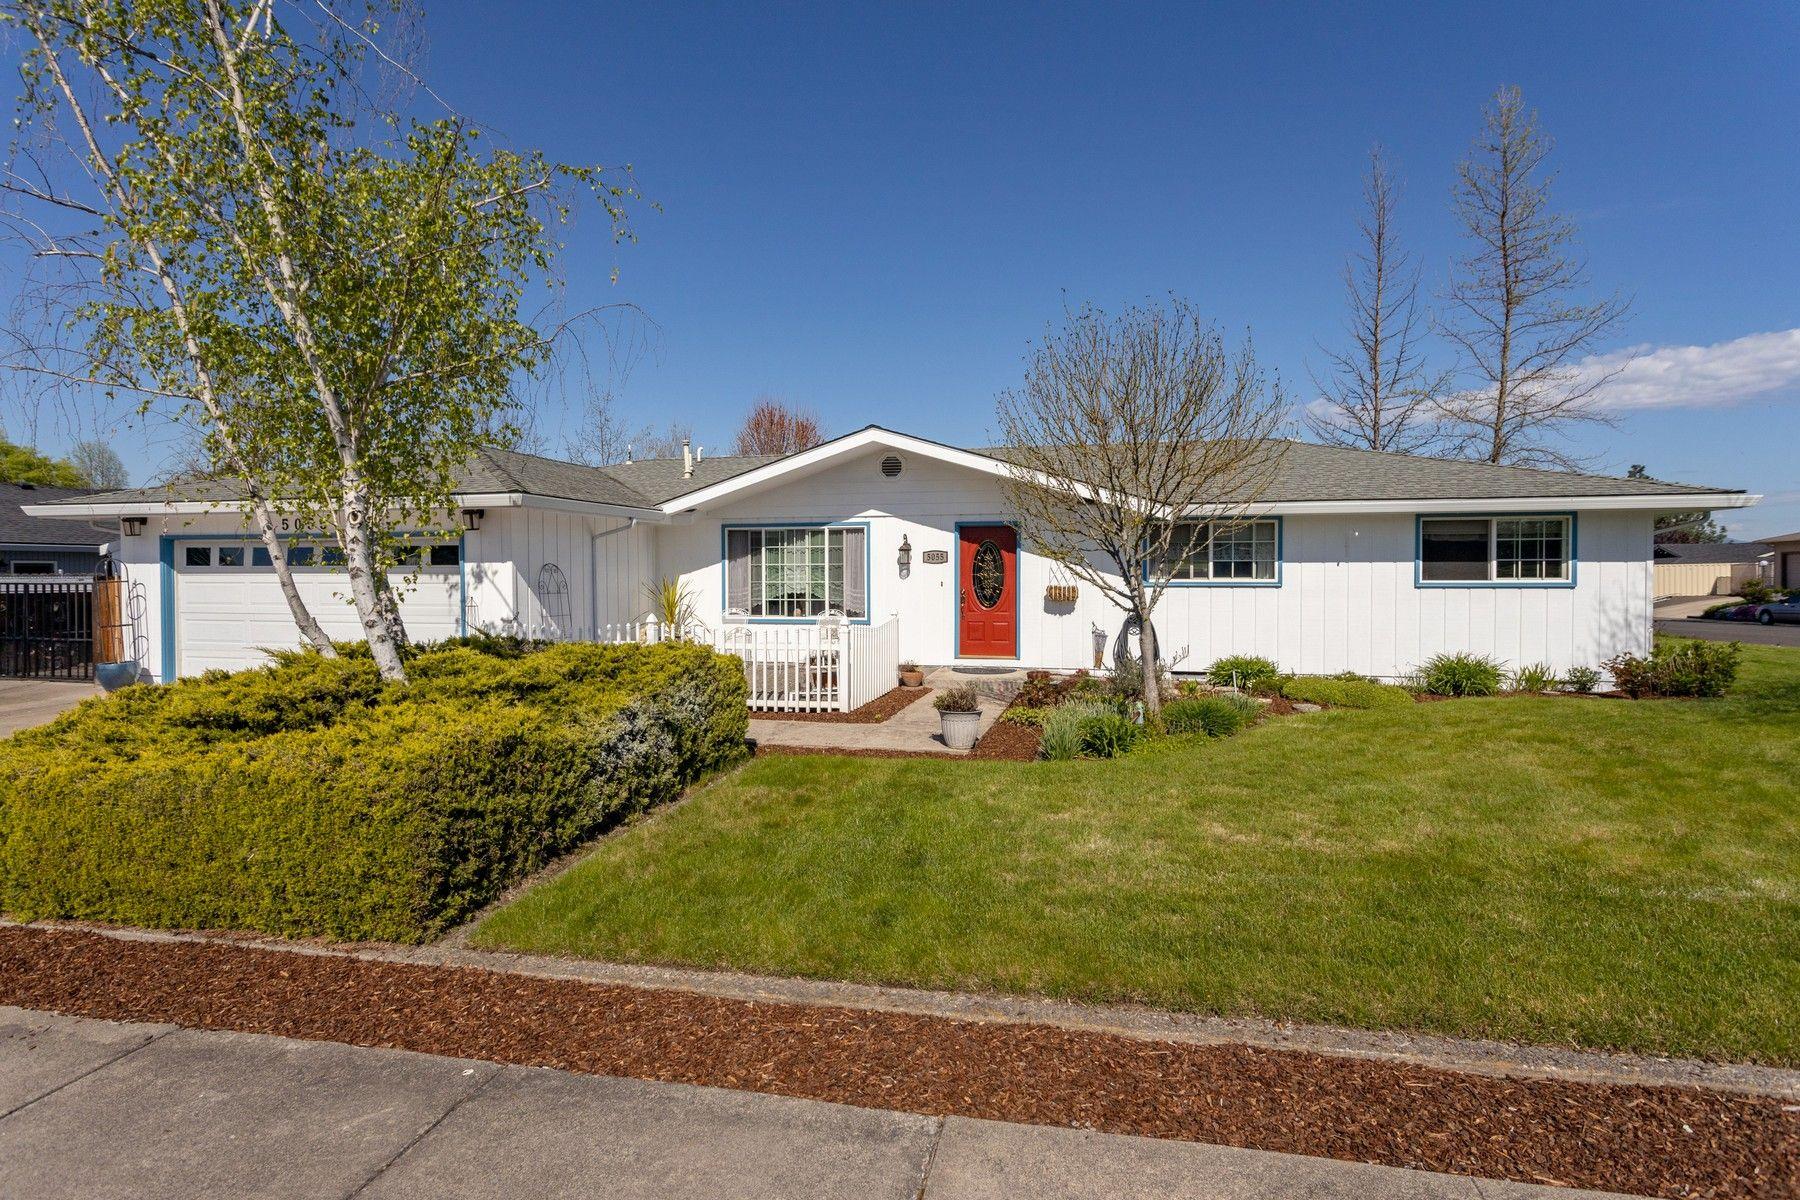 Other Residential Homes για την Πώληση στο 5055 Crestwood Avenue Central Point, OR 97502 Central Point, Ορεγκον 97502 Ηνωμένες Πολιτείες